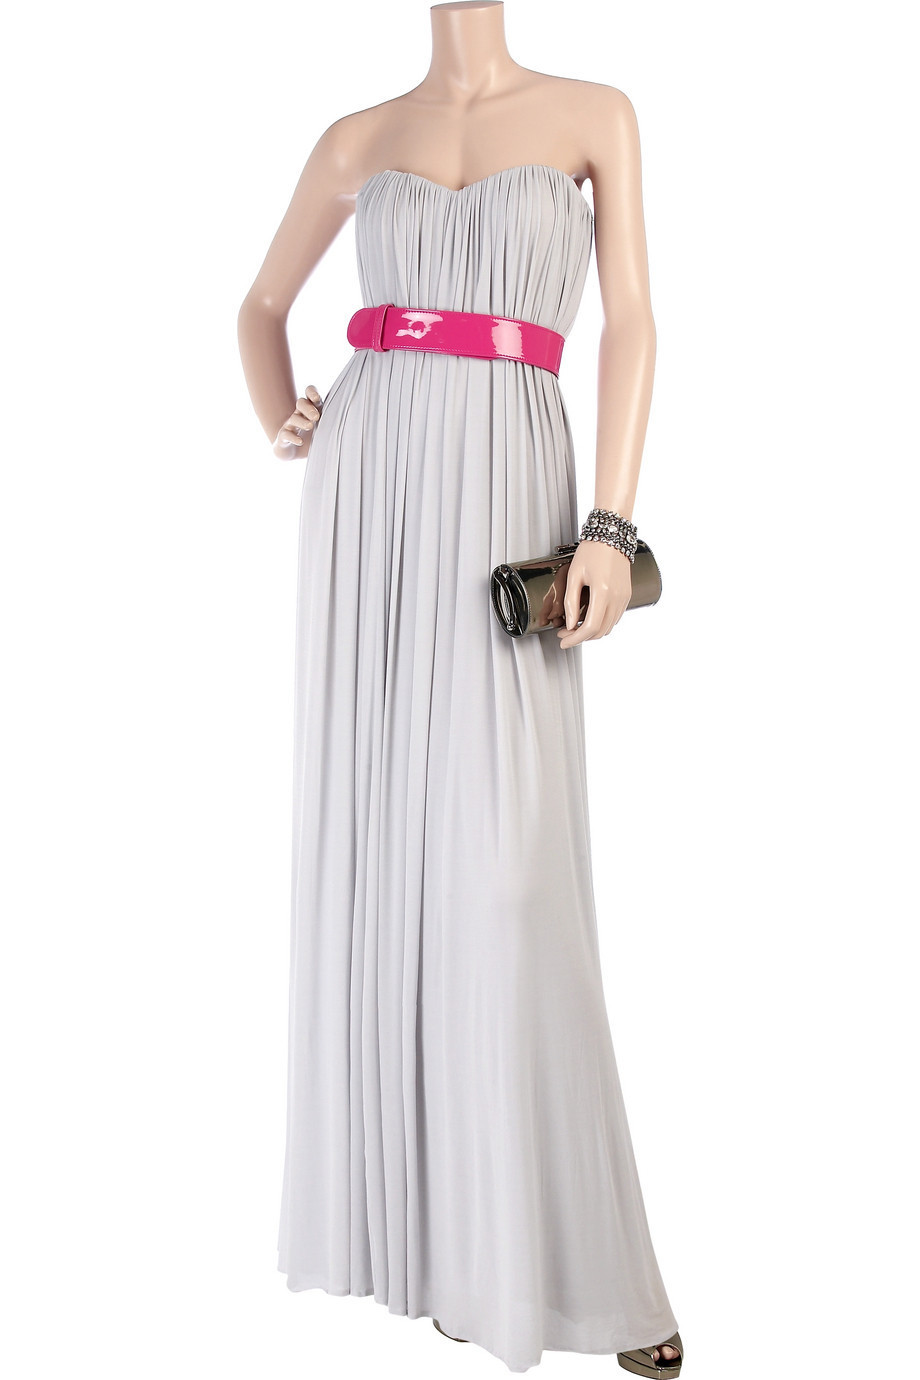 Alexander McQueen lilac gown